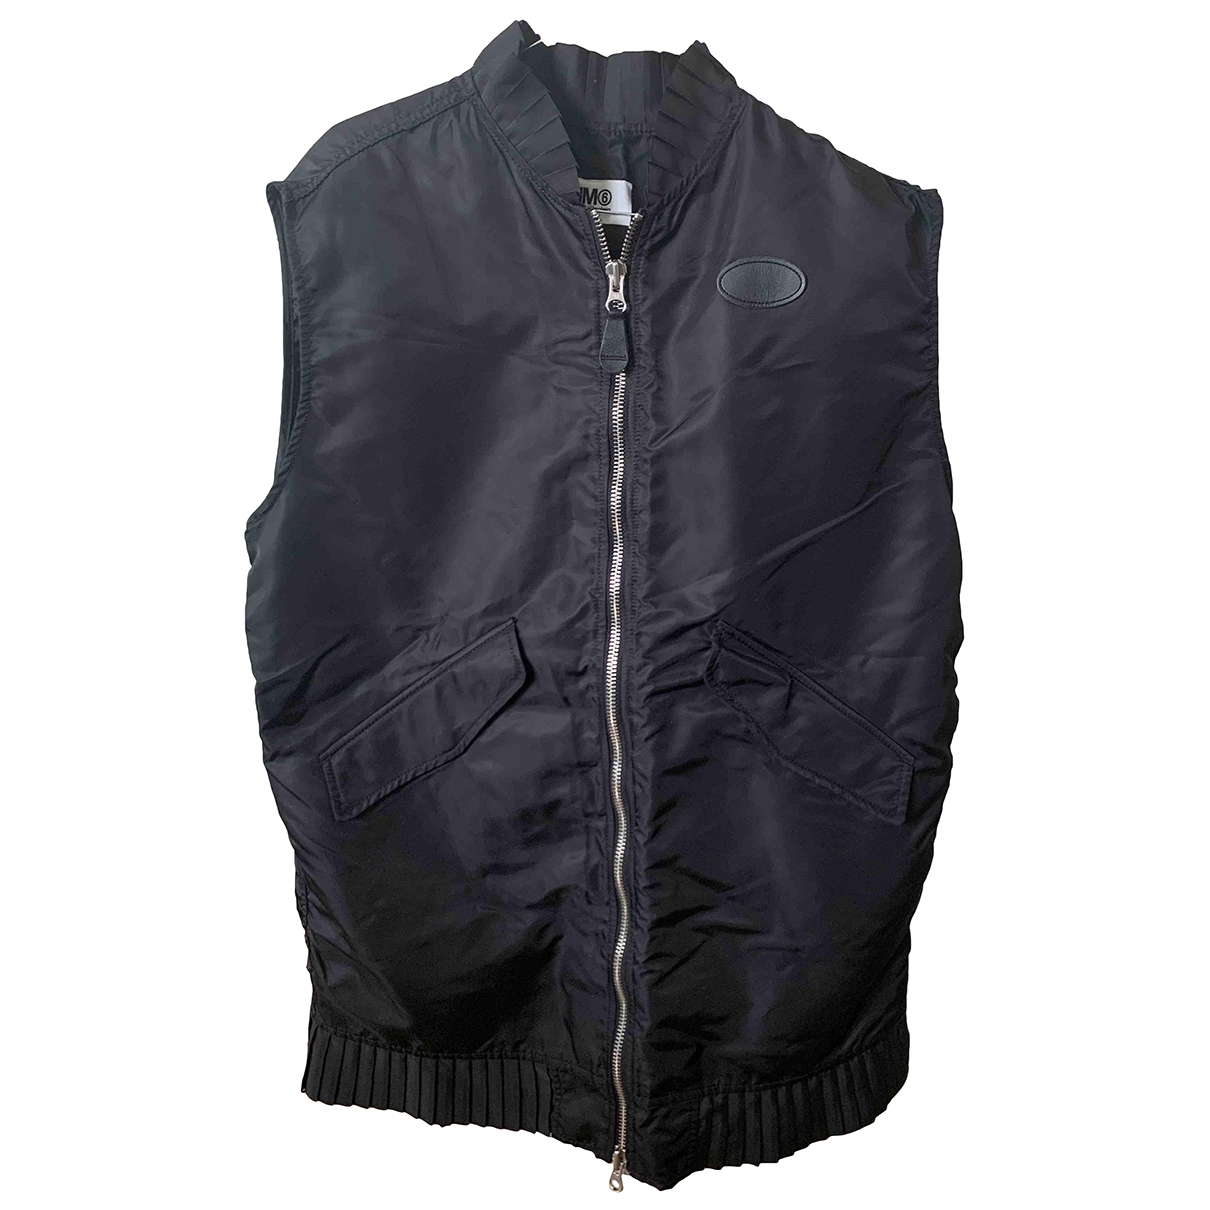 Mm6 \N Jacke in  Schwarz Polyester